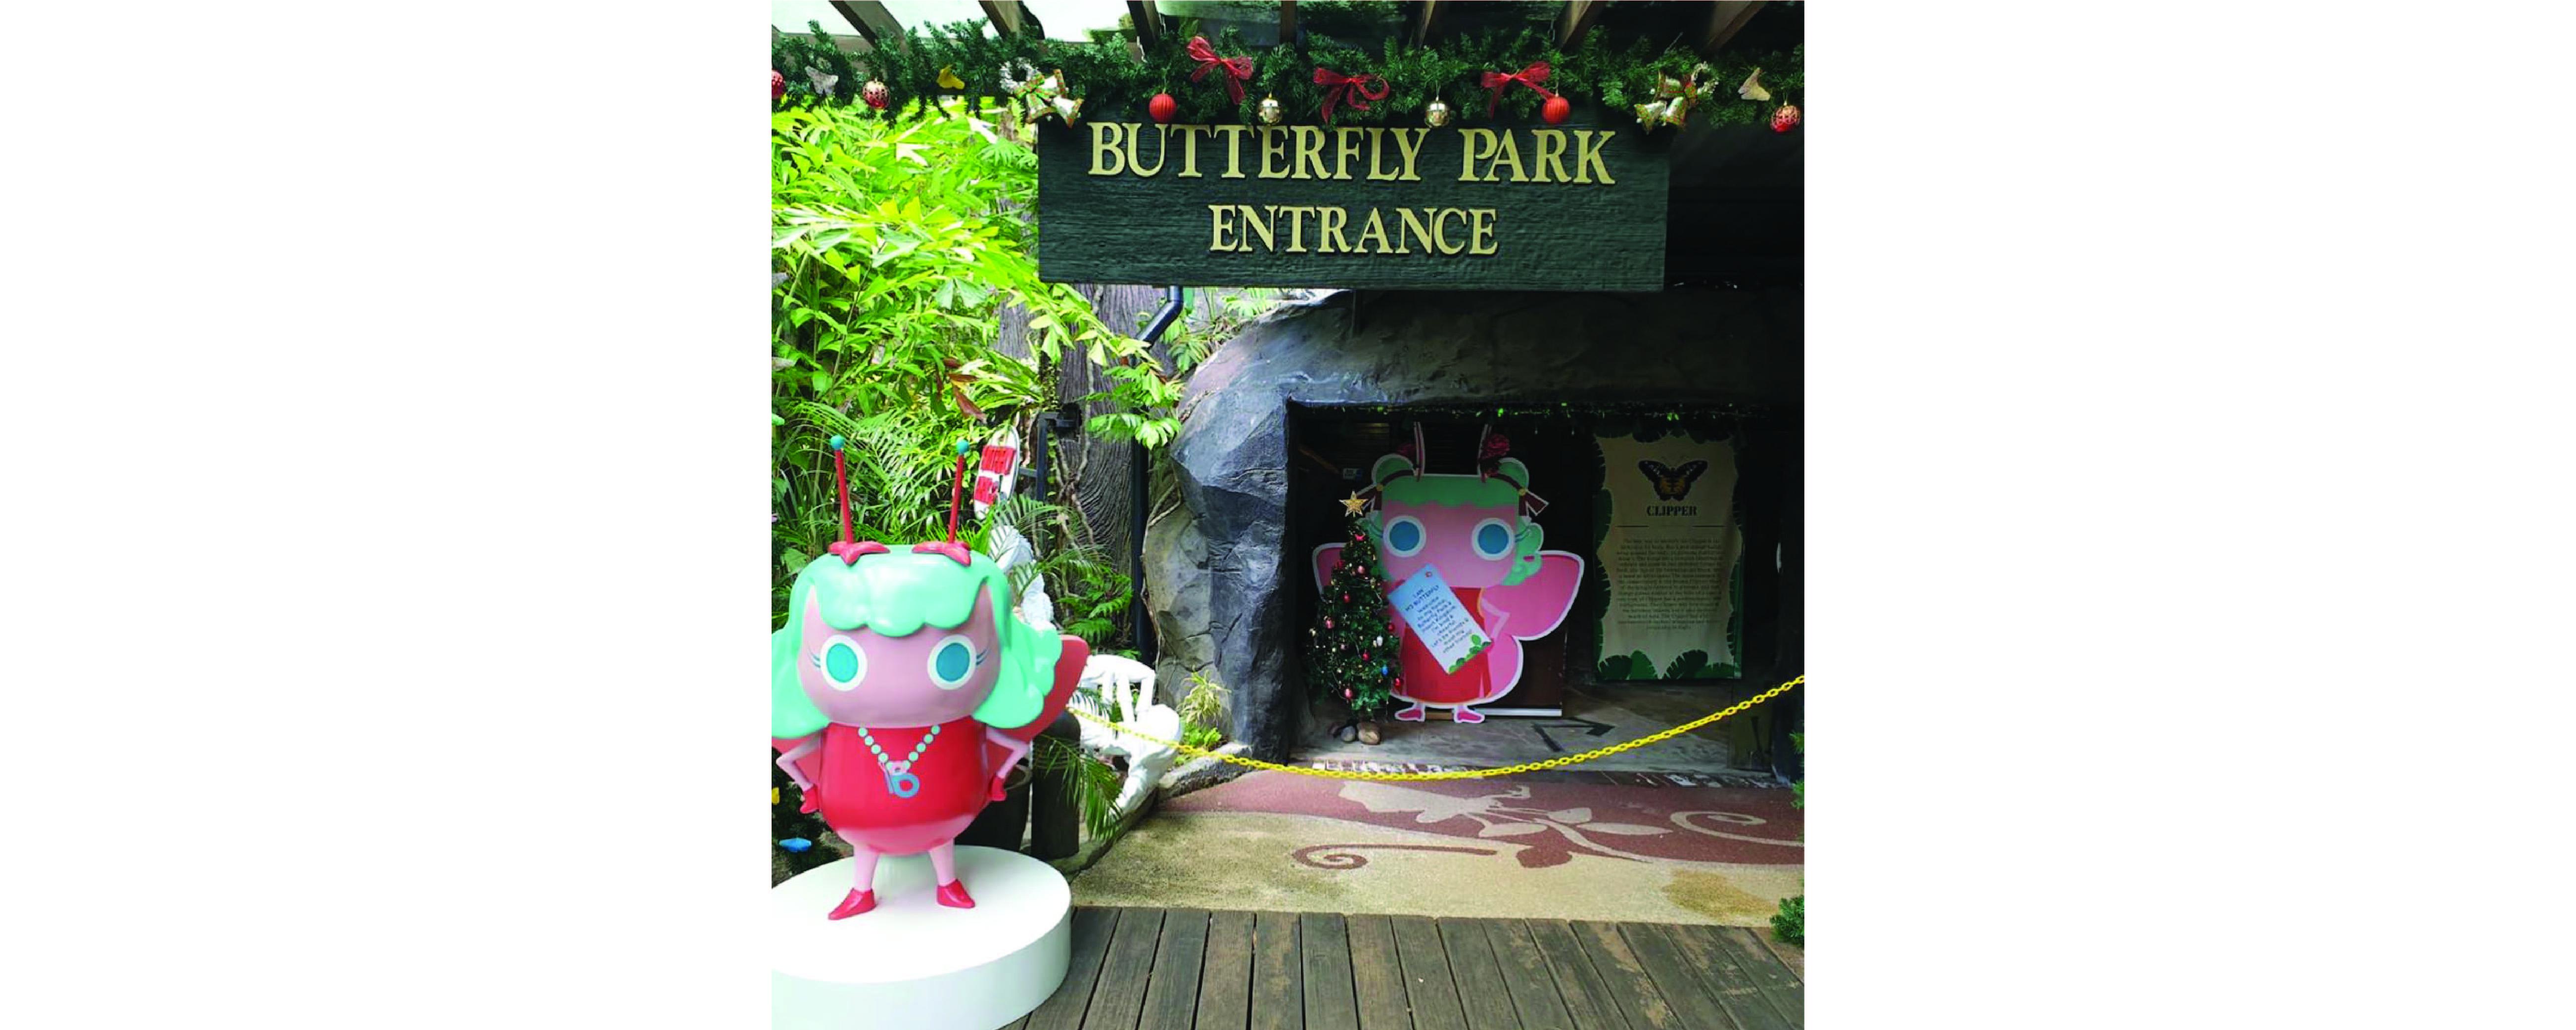 ButterflyPark-01